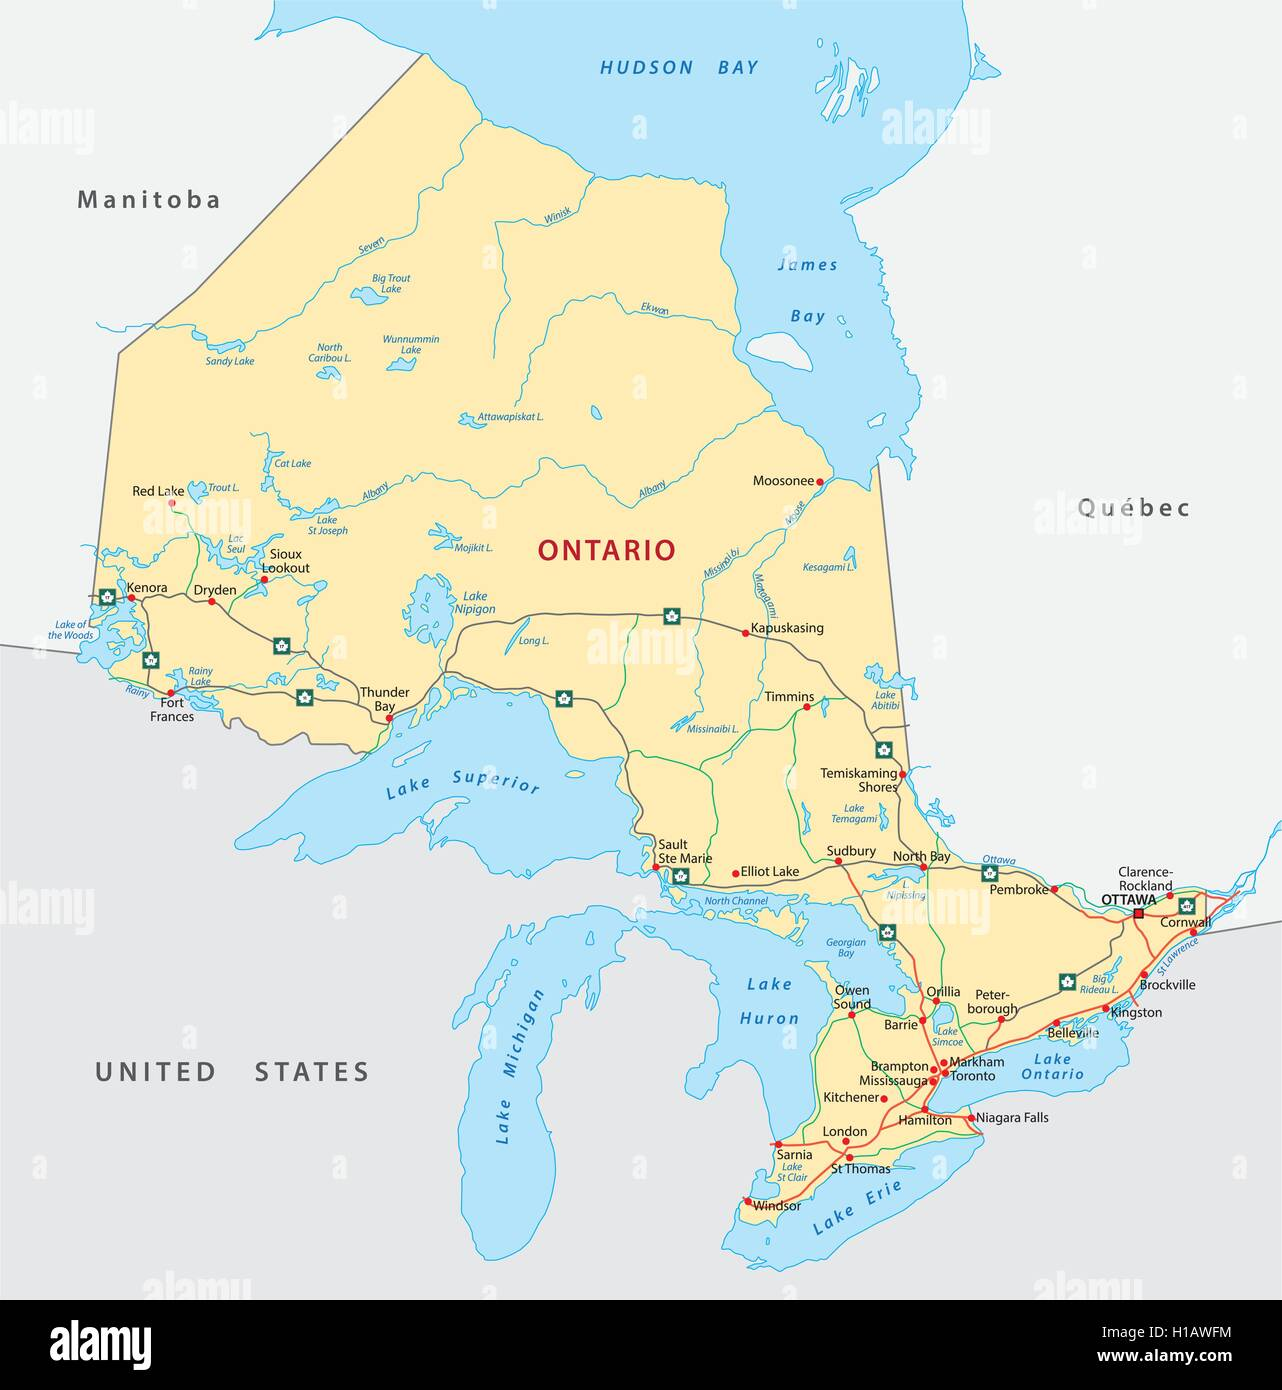 Ontario Map Stock Photos & Ontario Map Stock Images - Alamy